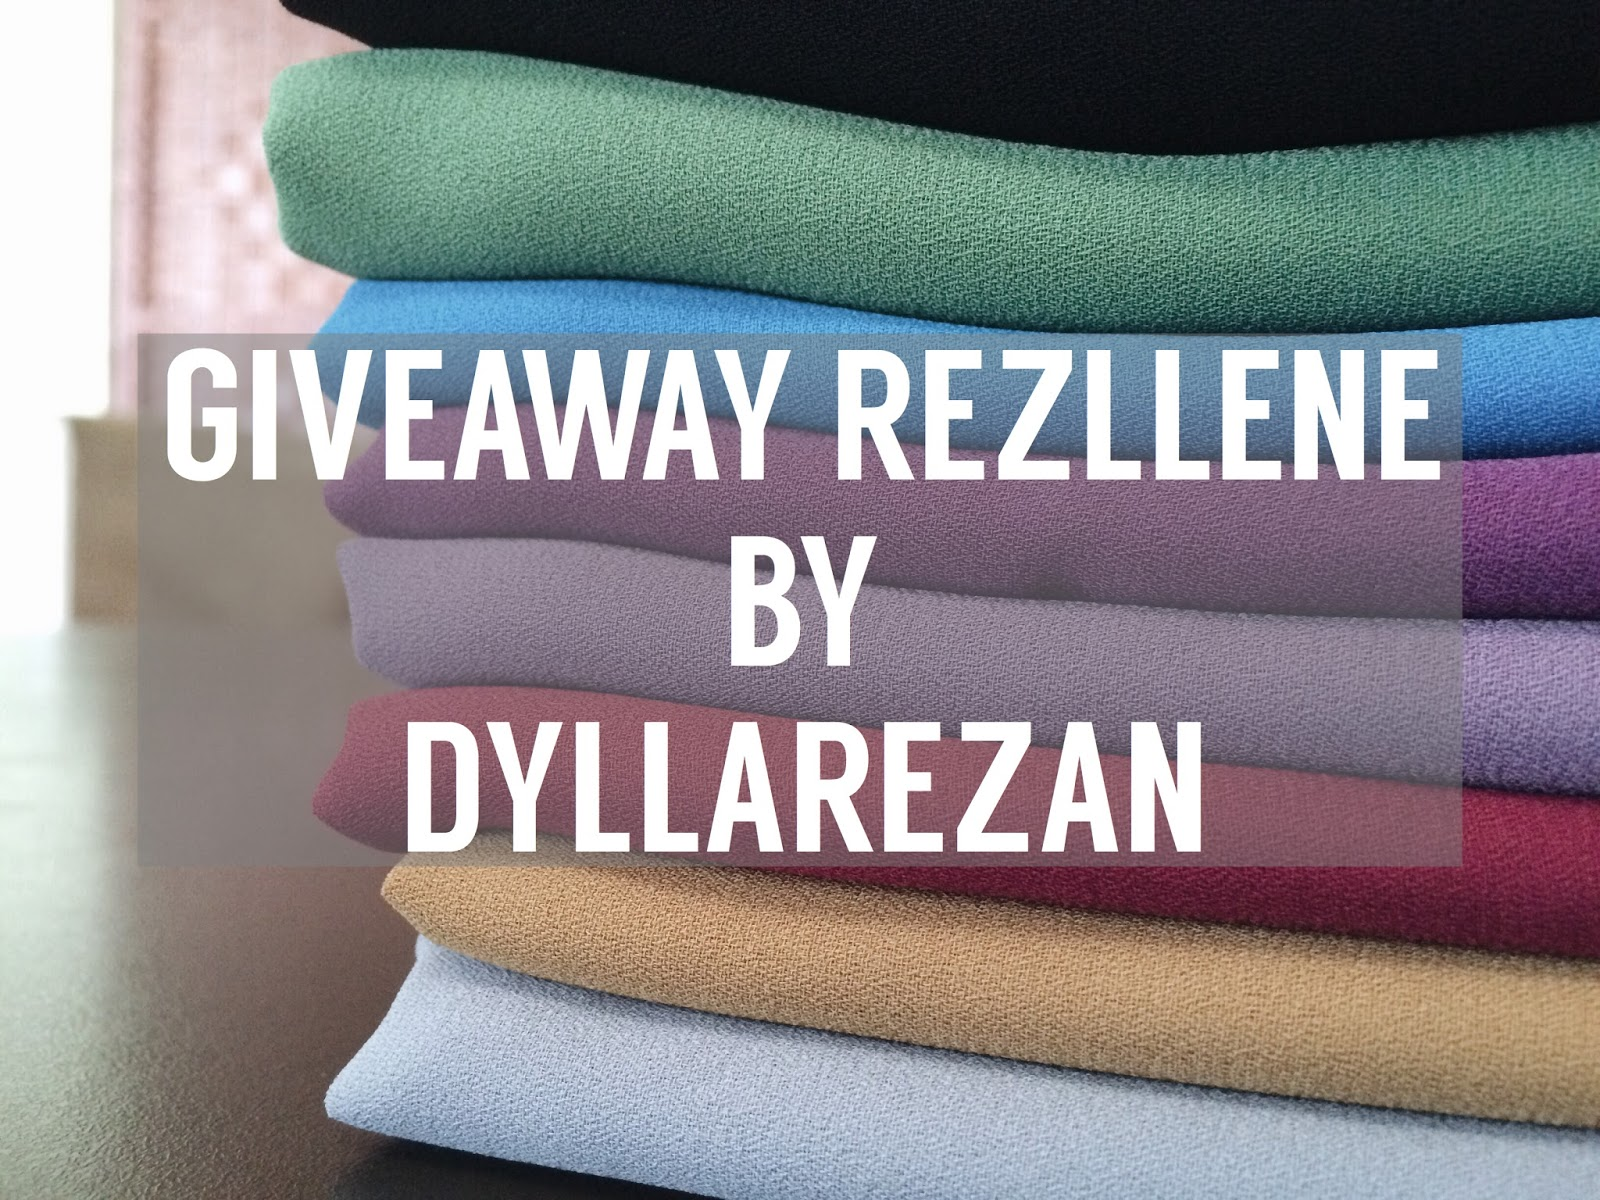 REZLLENE GIVEAWAY BY DYLLAREZAN